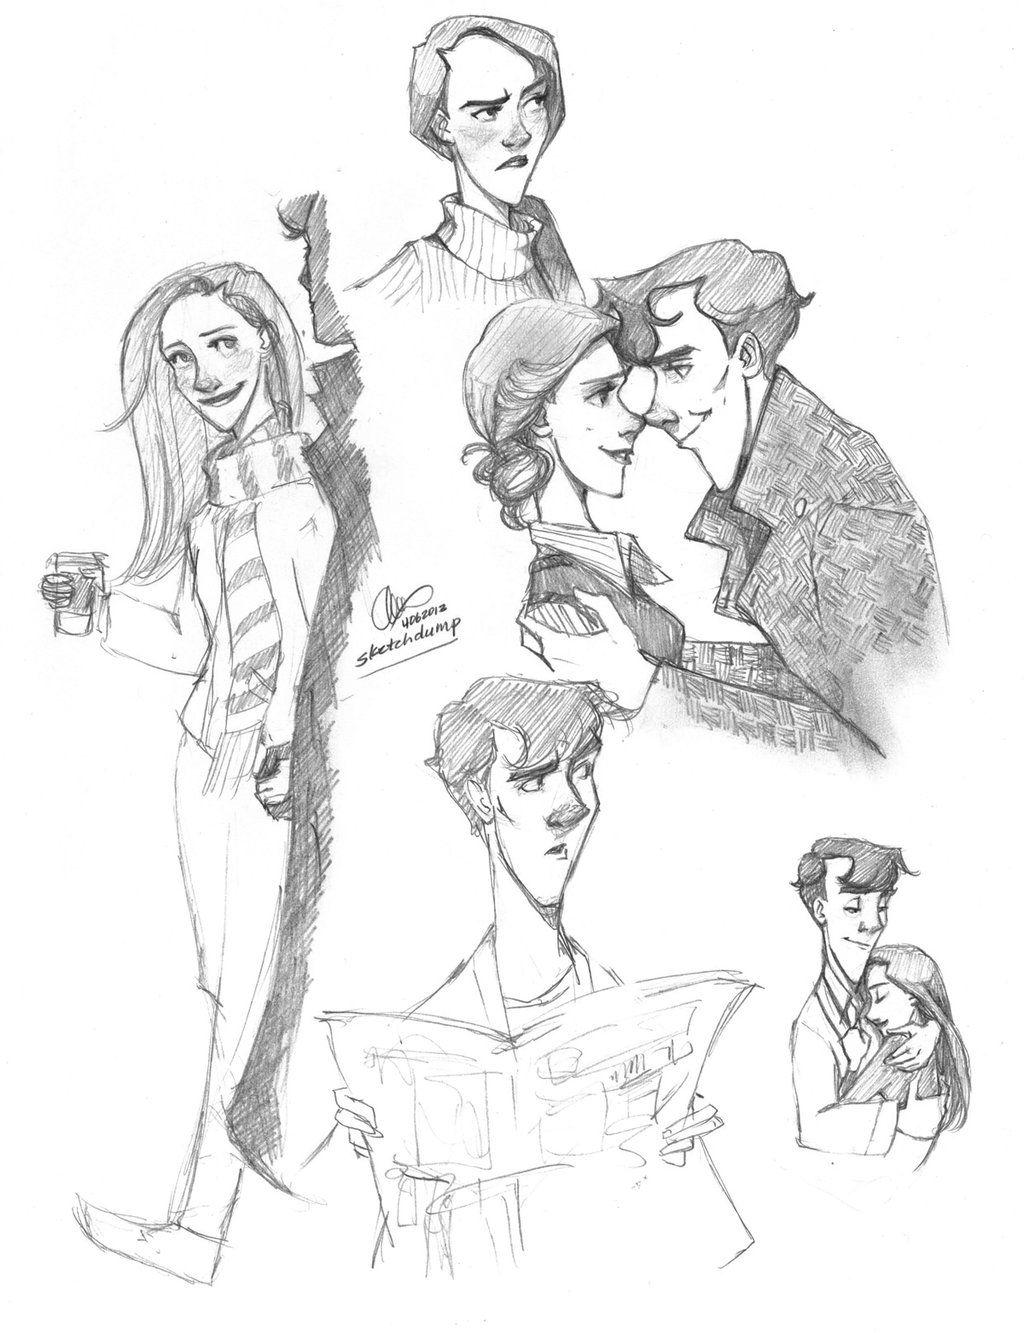 Sherlolly Sketchdump By Lexieken On Deviantart